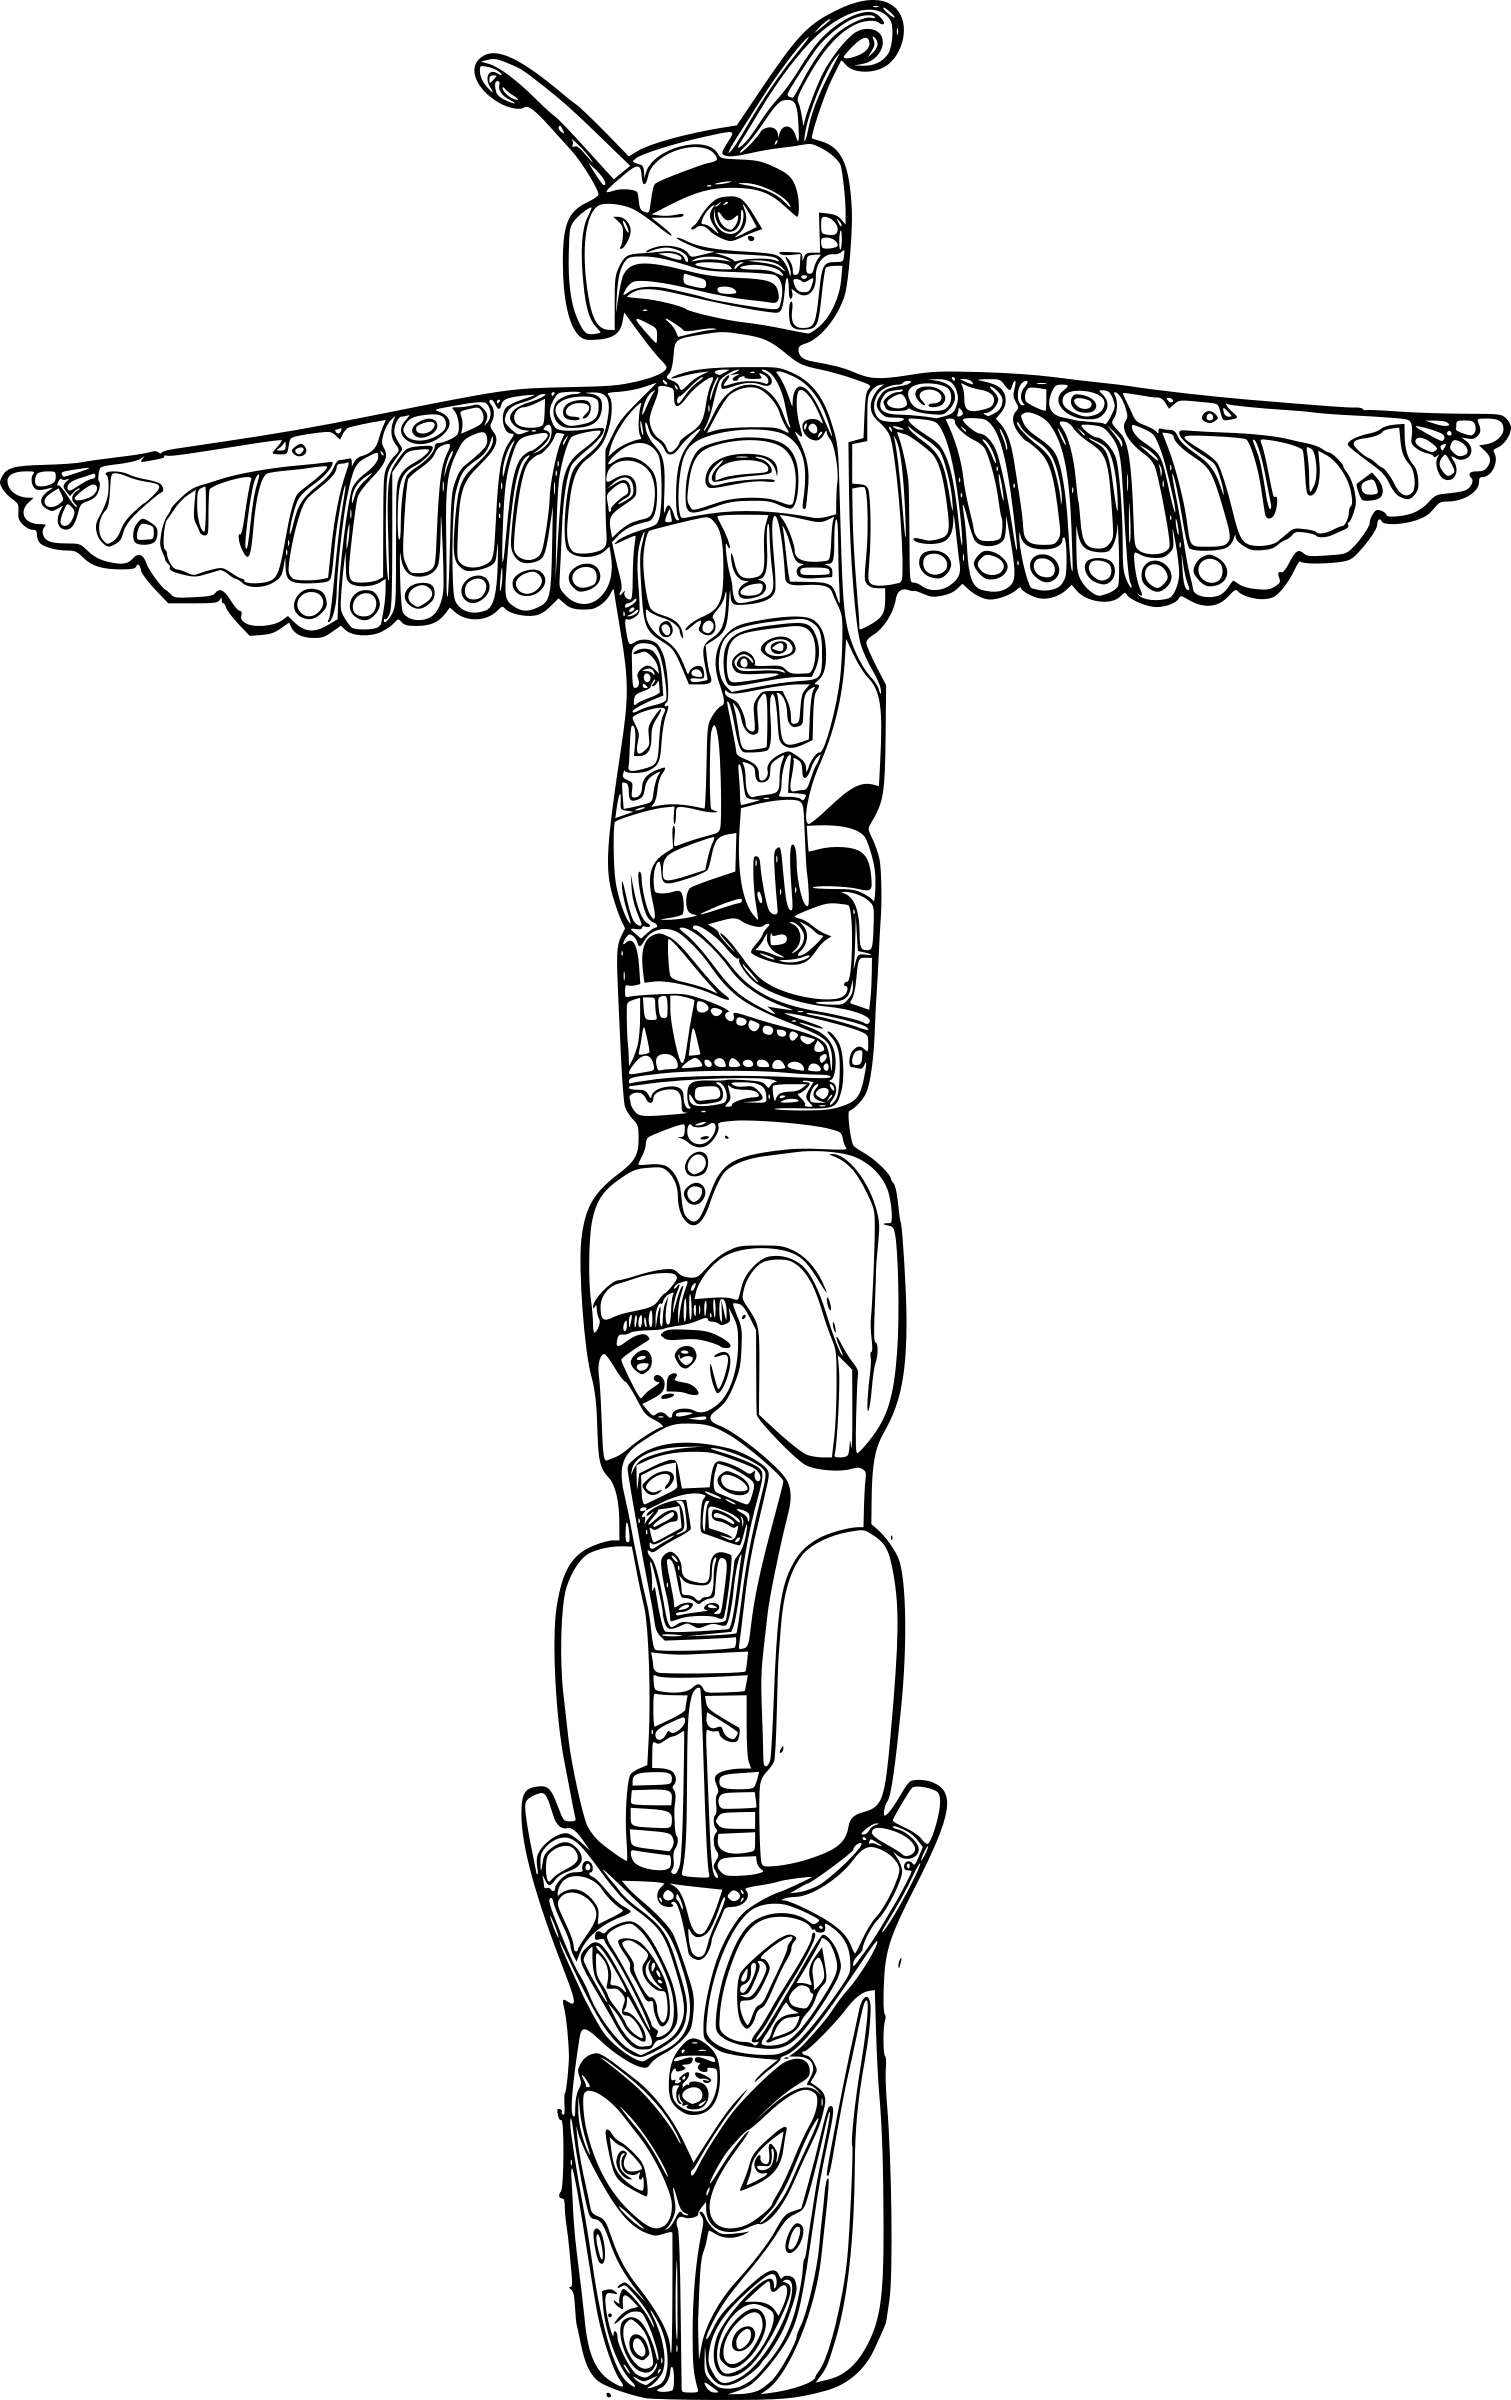 vector royalty free stock Totem Drawing at GetDrawings